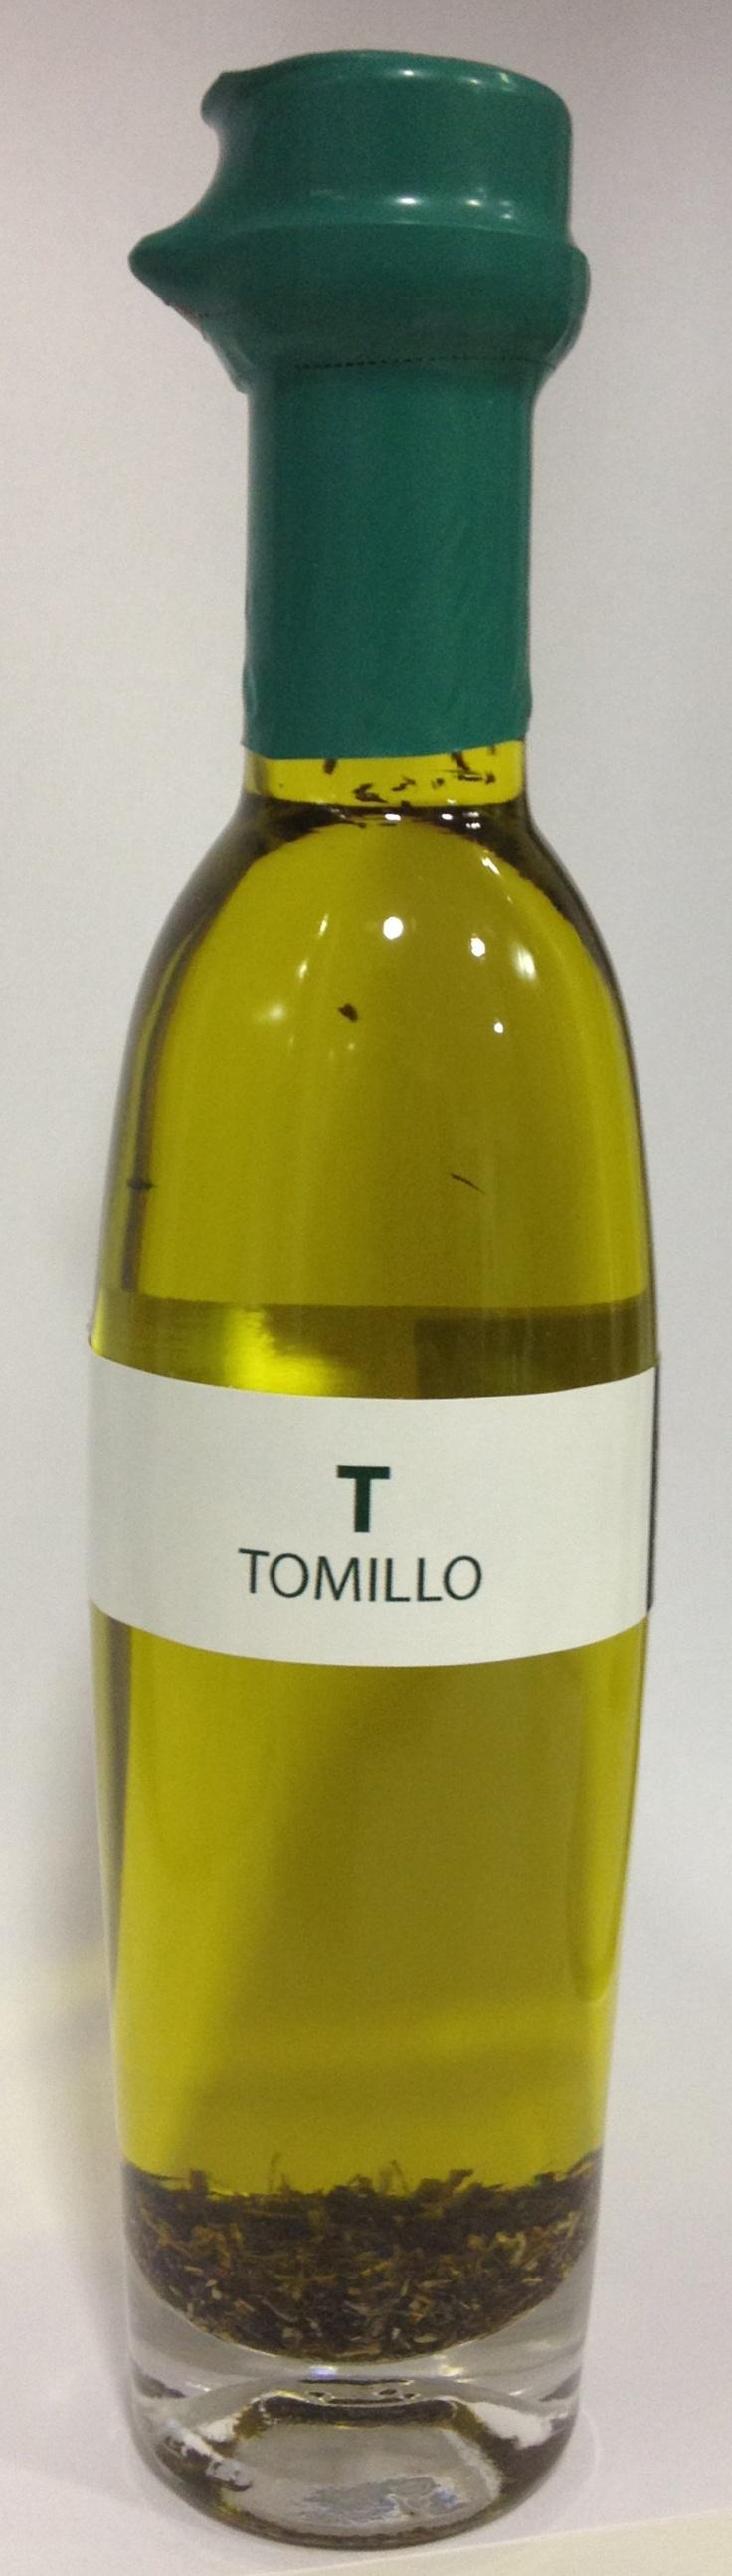 Aceite de oliva virgen extra ecostean con tomillo!